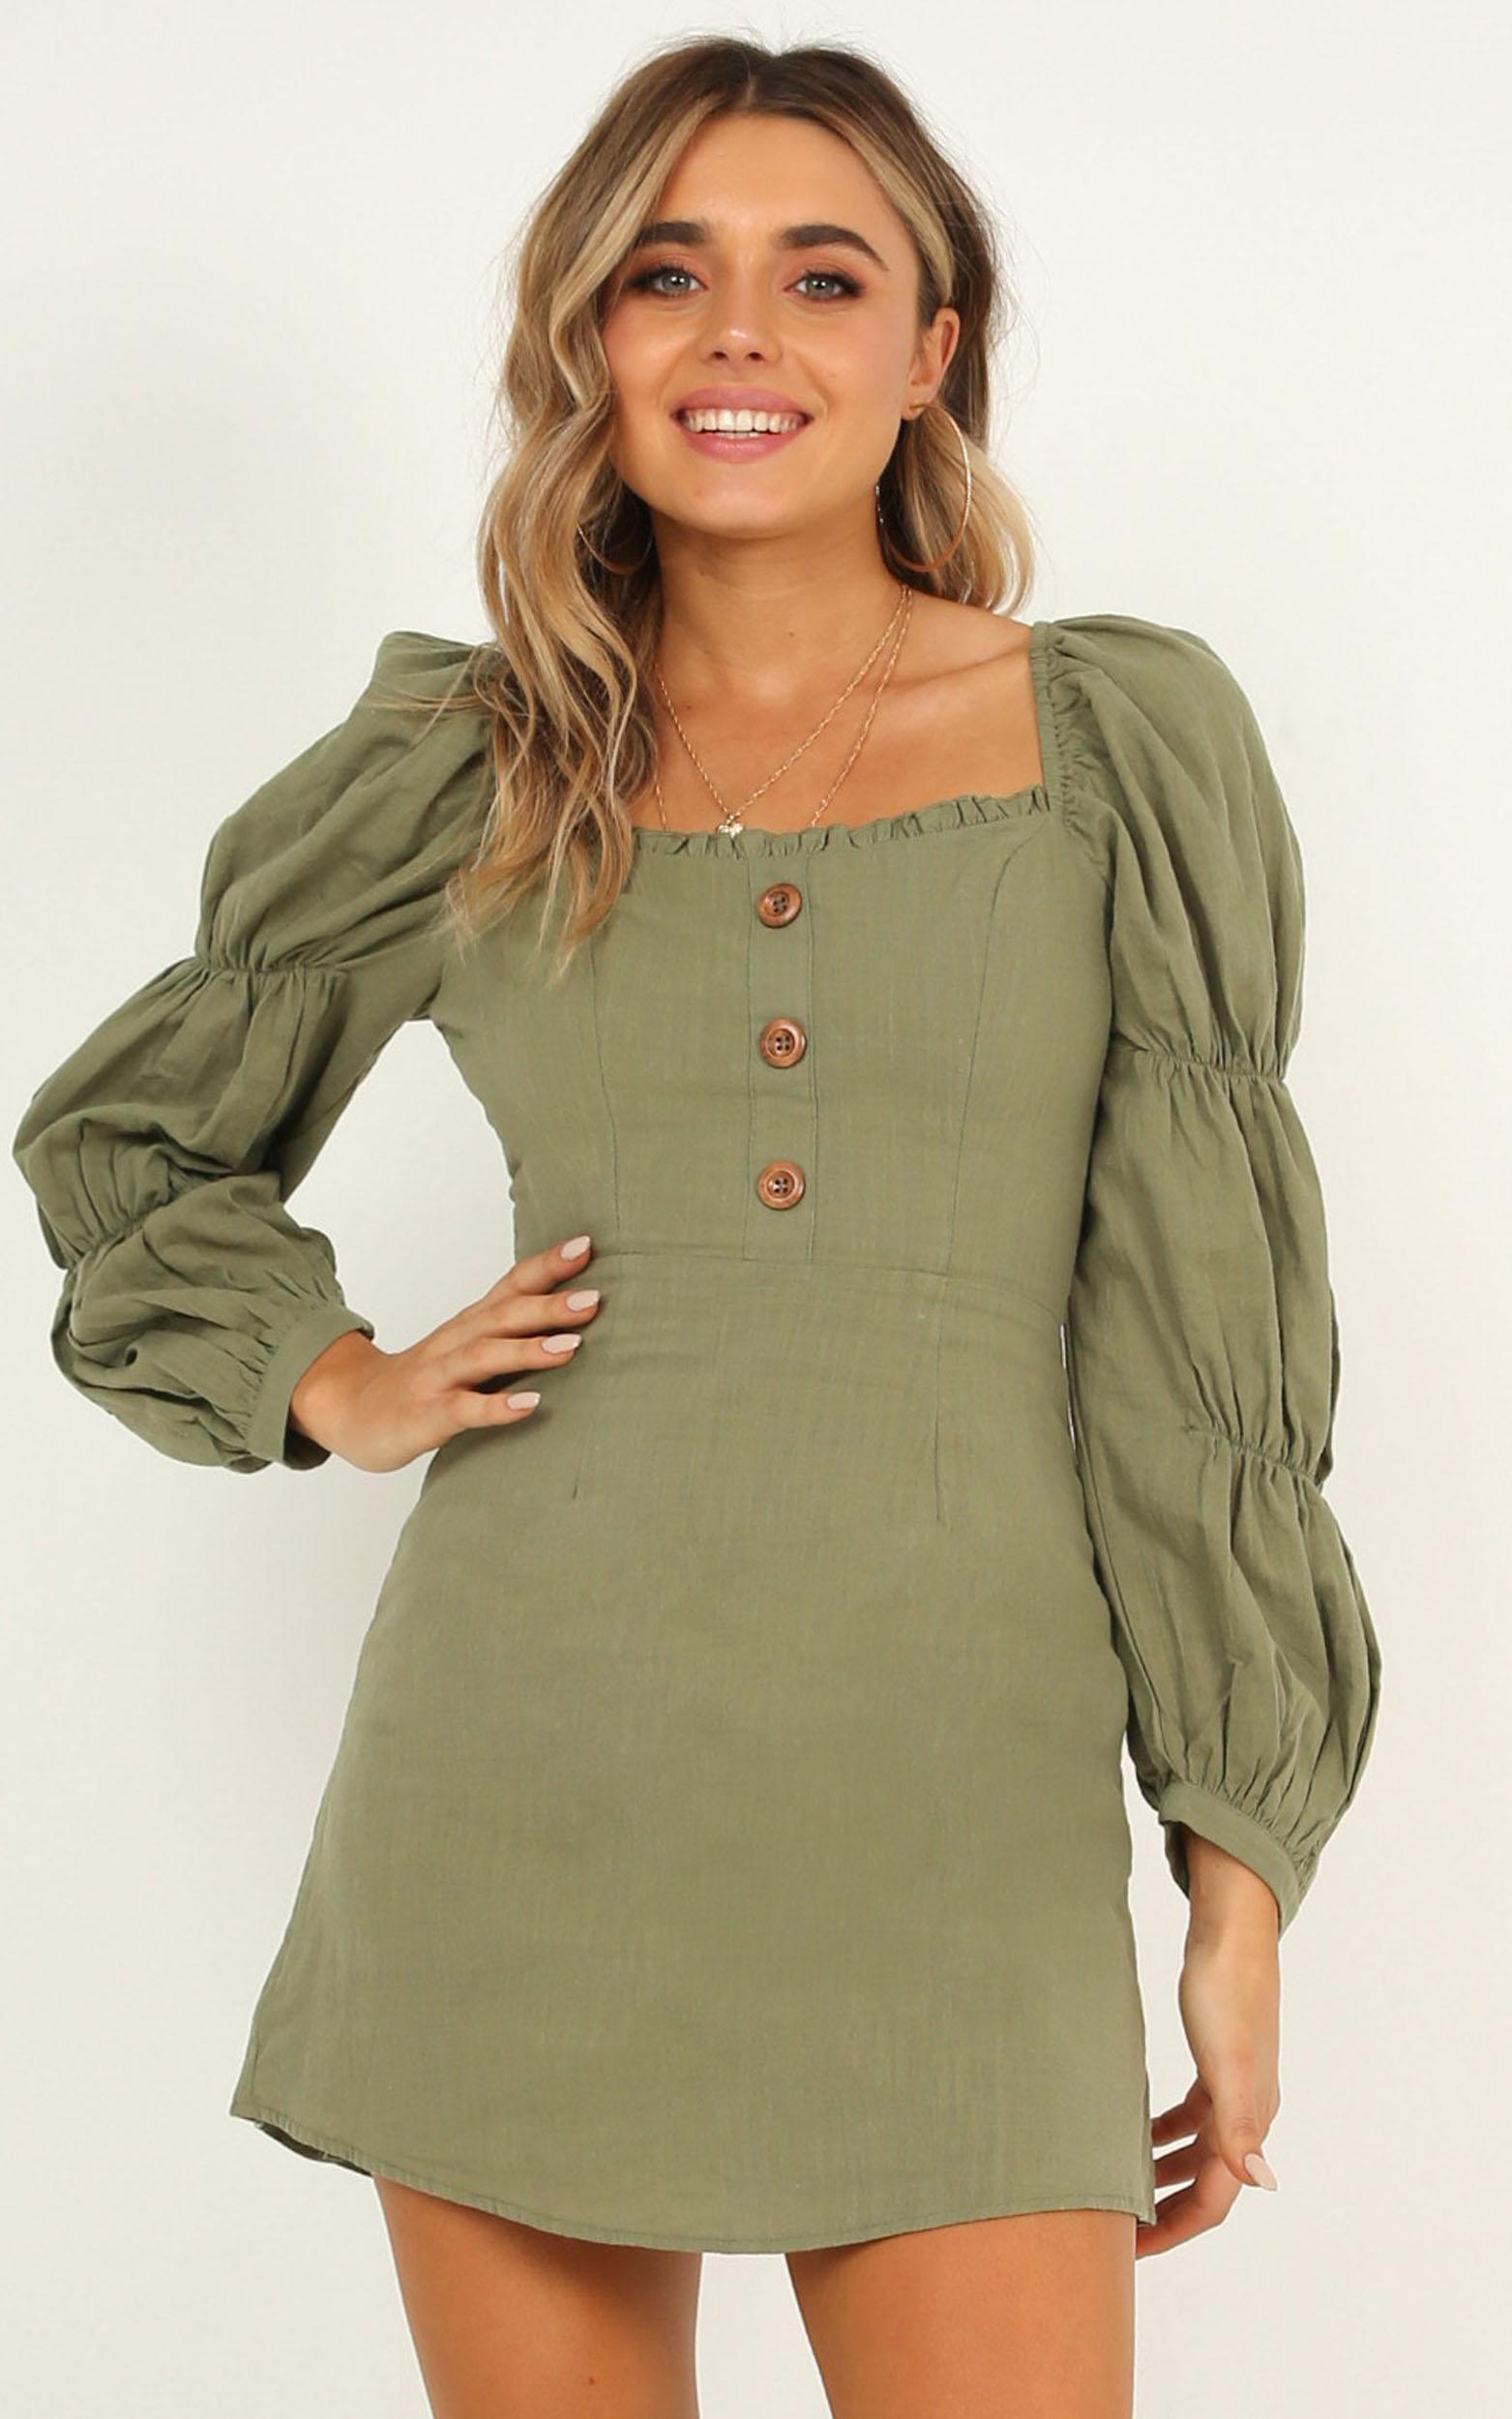 European Escape dress in khaki linen - 12 (L), Khaki, hi-res image number null